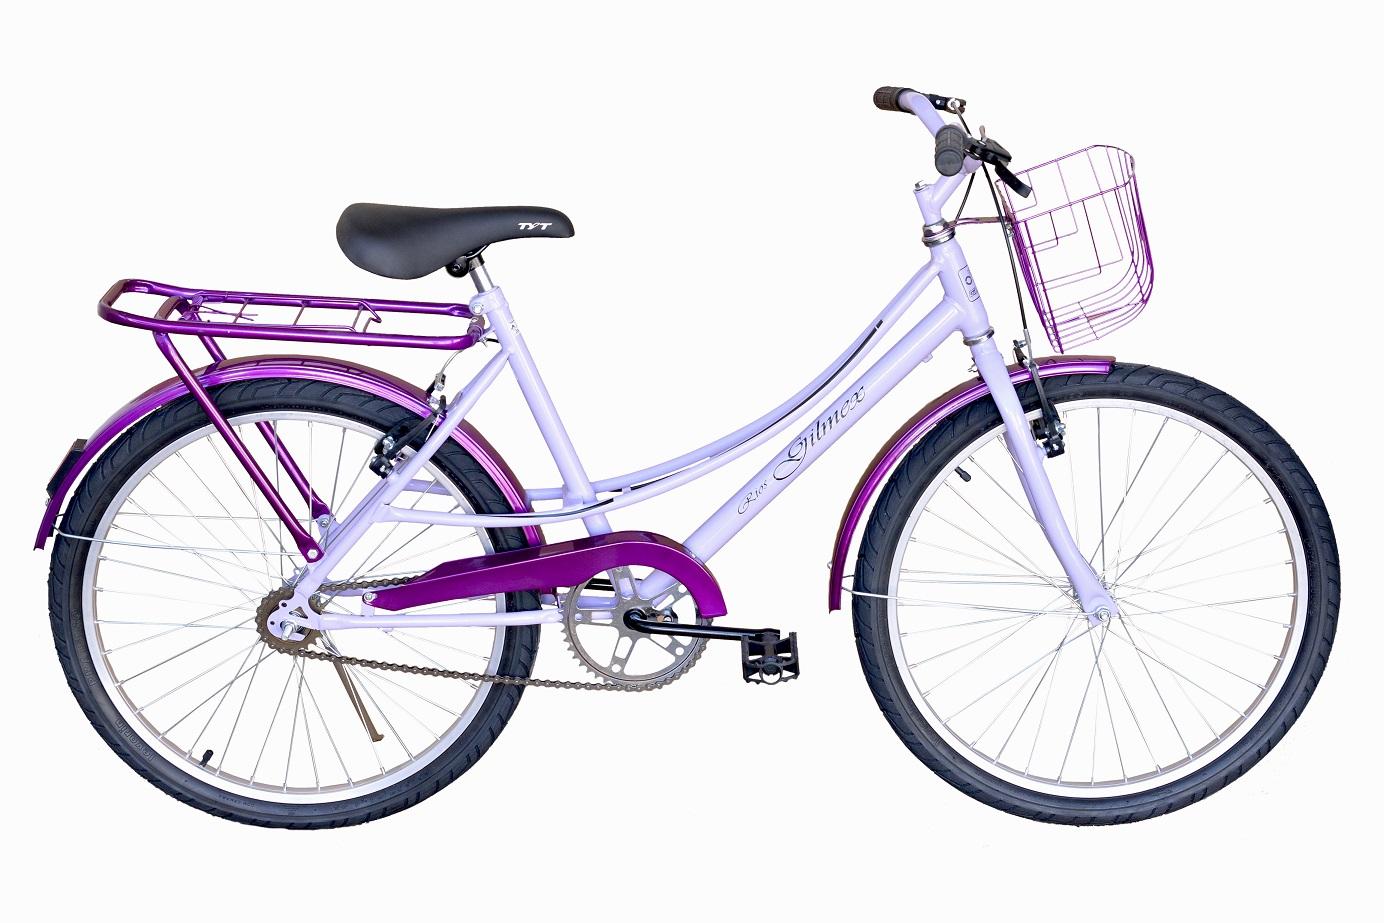 Bicicleta Aro 24 Passeio Infantil Gilmex Lilás C/ Roxo